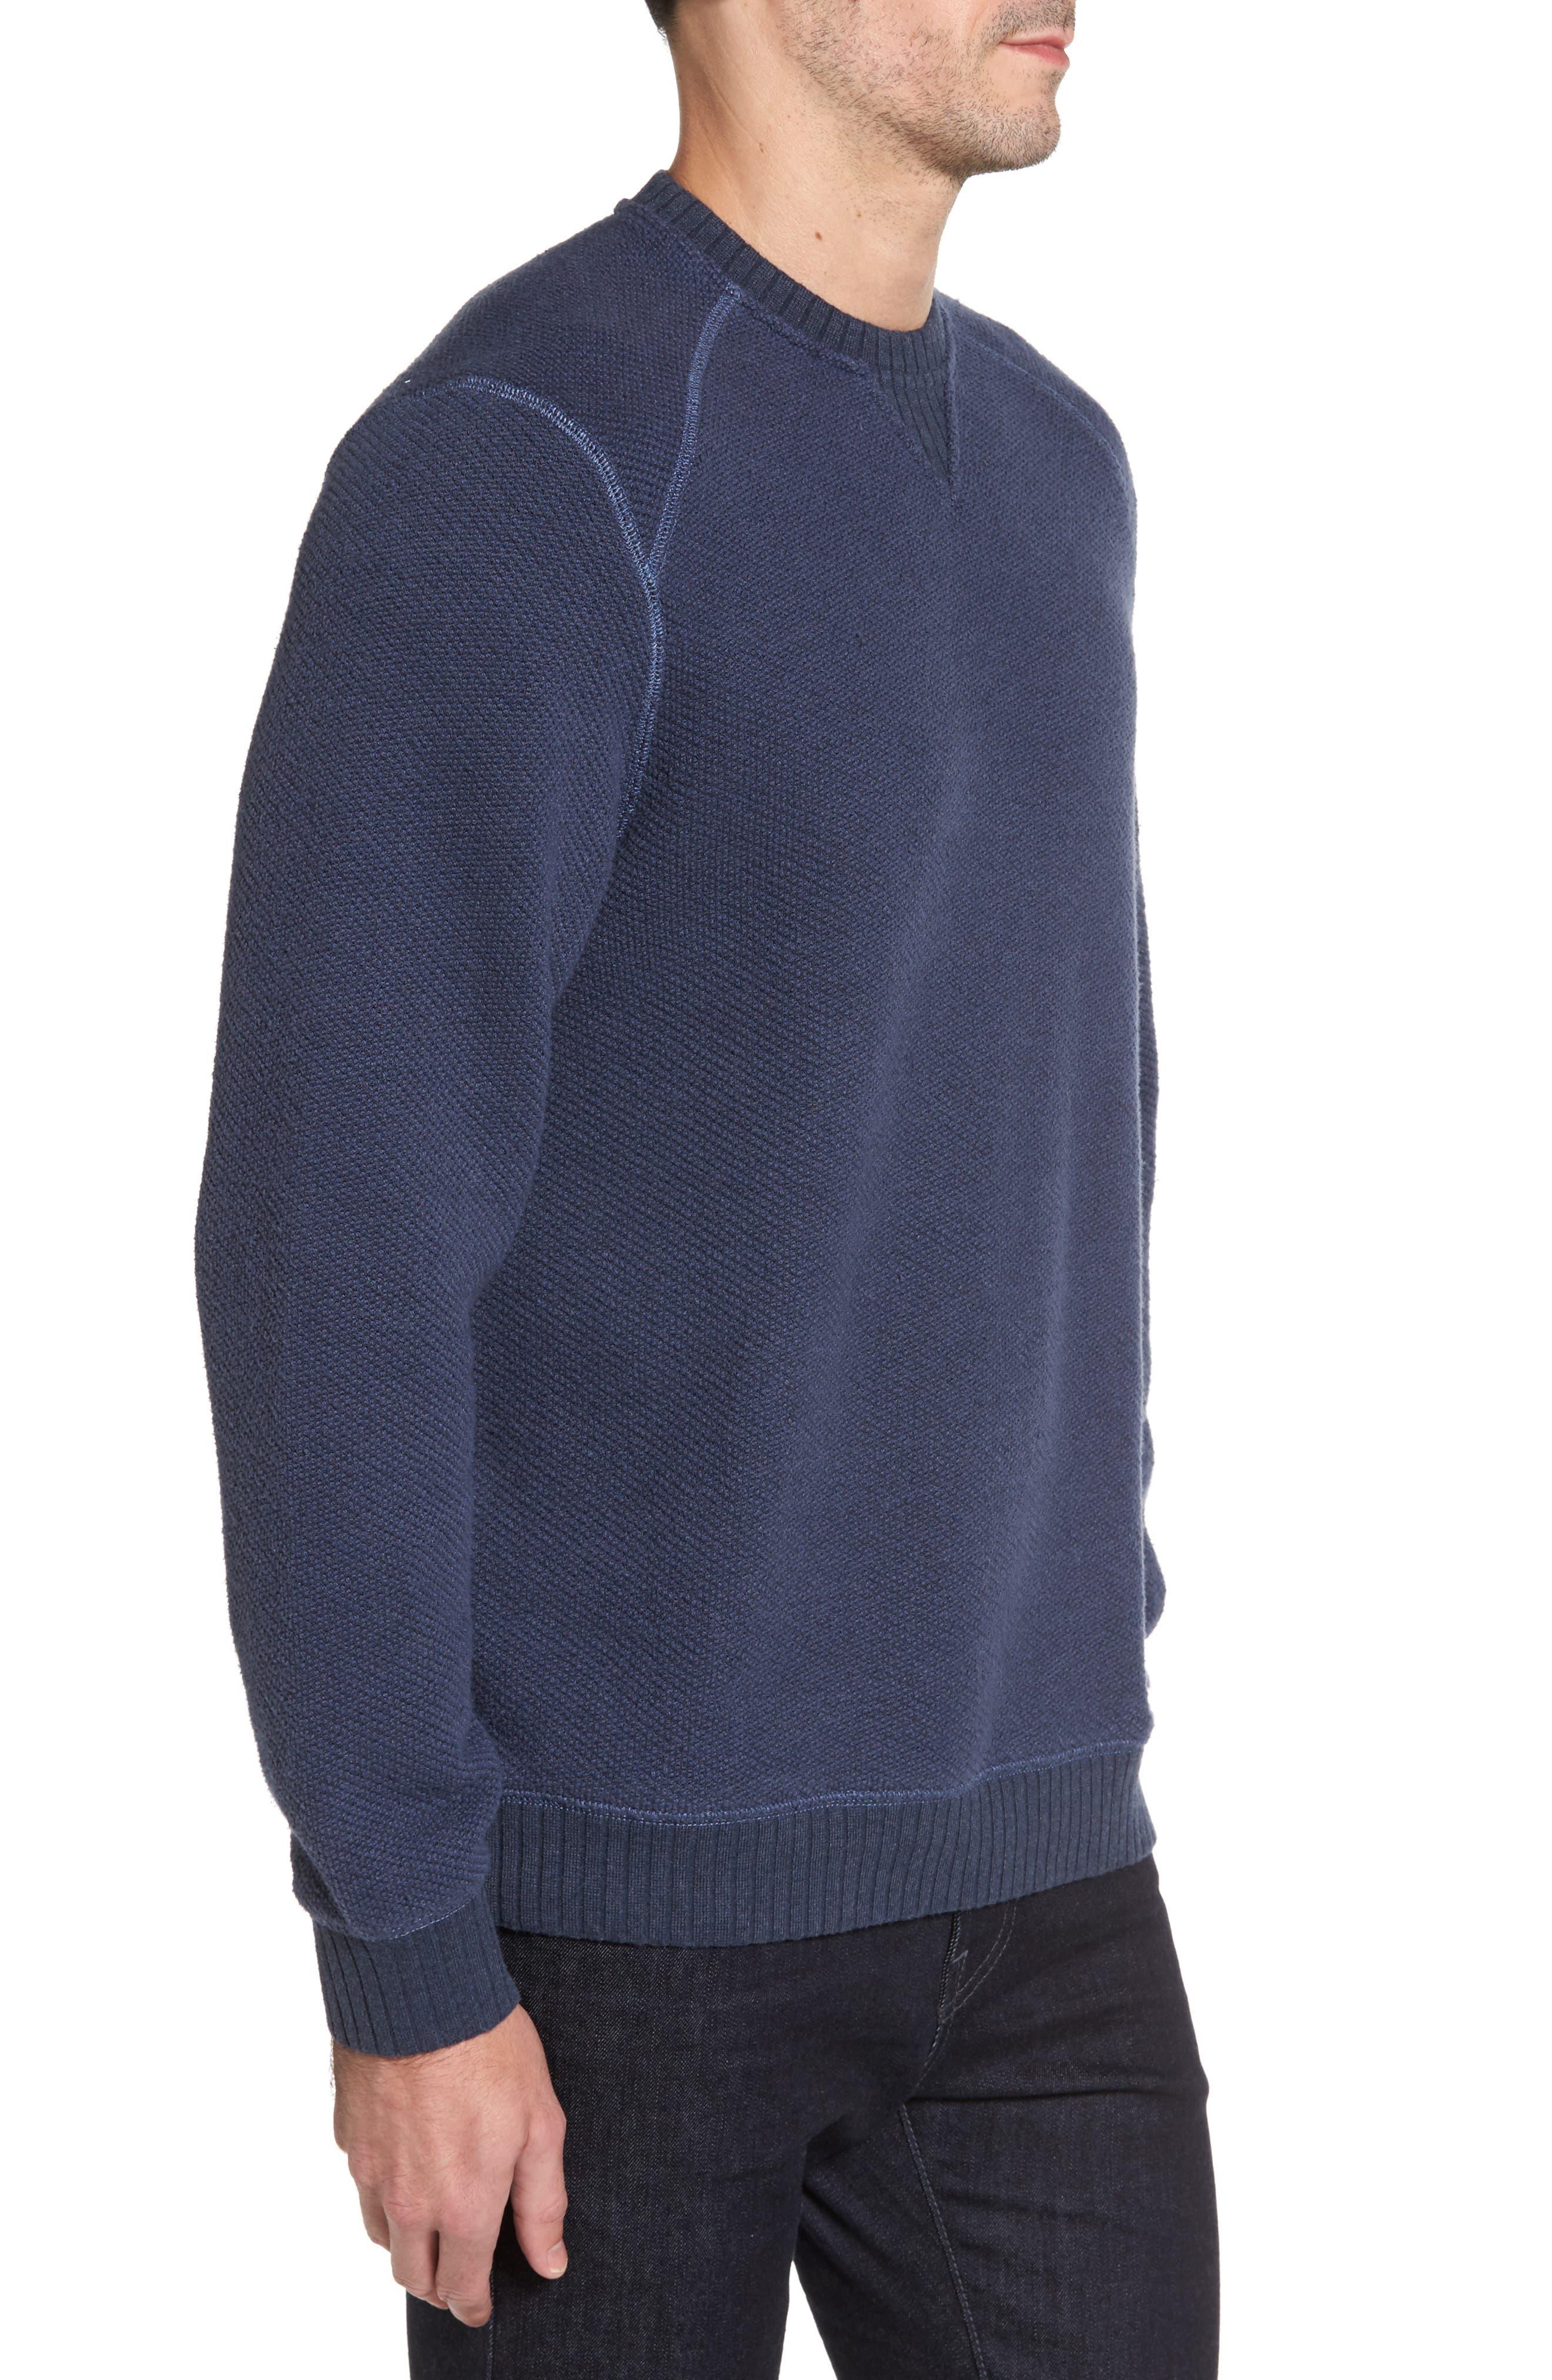 Surfari Crewneck Sweatshirt,                             Alternate thumbnail 3, color,                             001